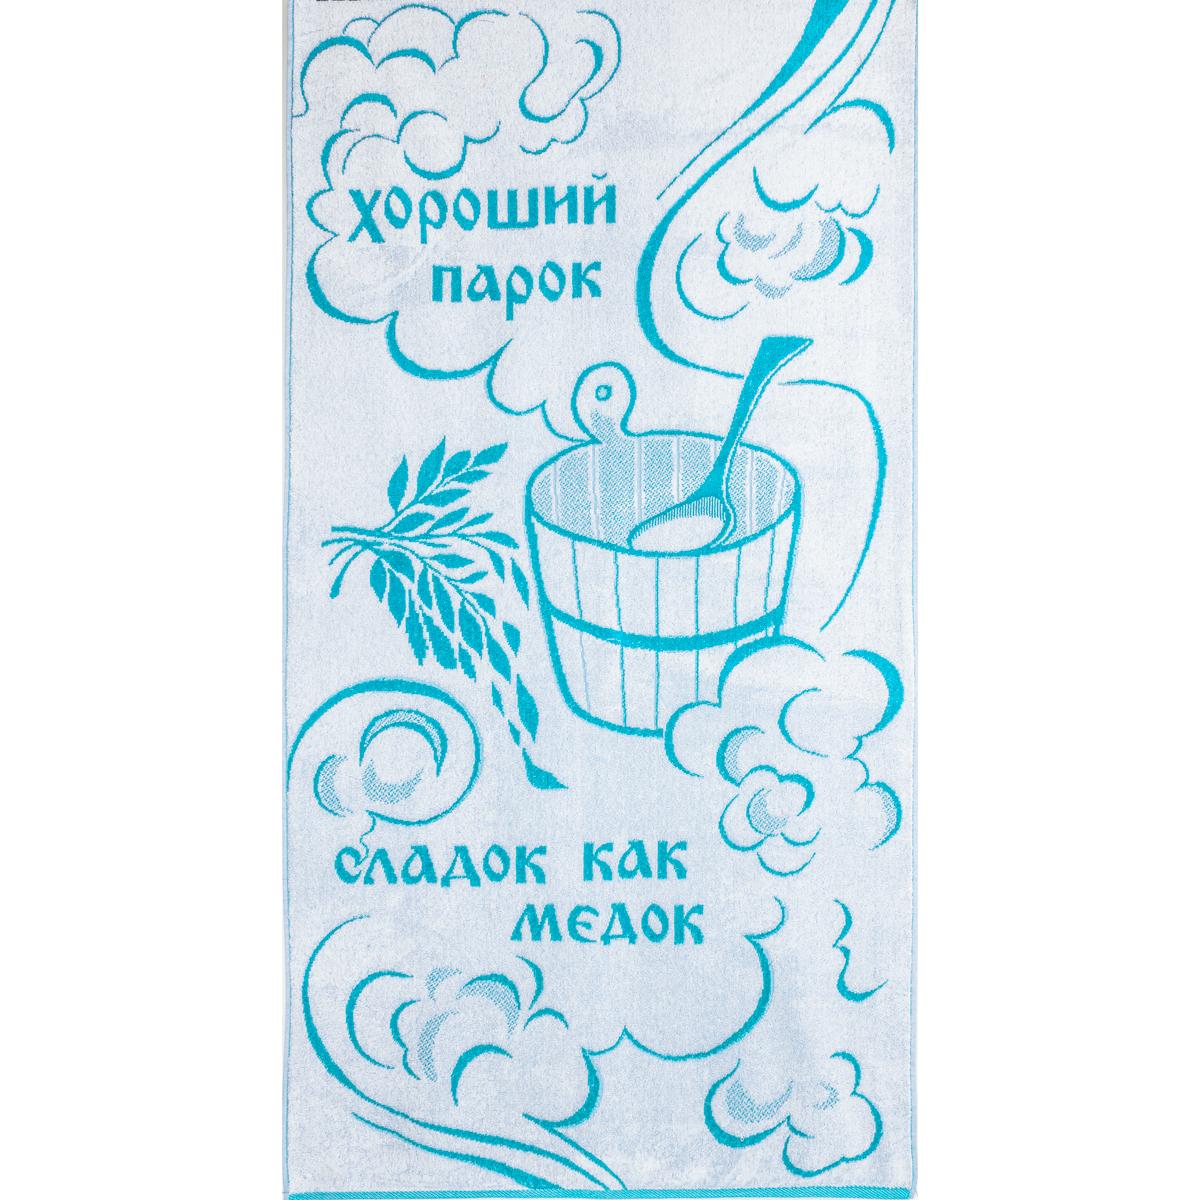 Полотенце Хороший парок, размер 70х140 см.Махровые полотенца<br>Плотность ткани: 420 г/кв. м<br><br>Тип: Полотенце<br>Размер: 70х140<br>Материал: Махра